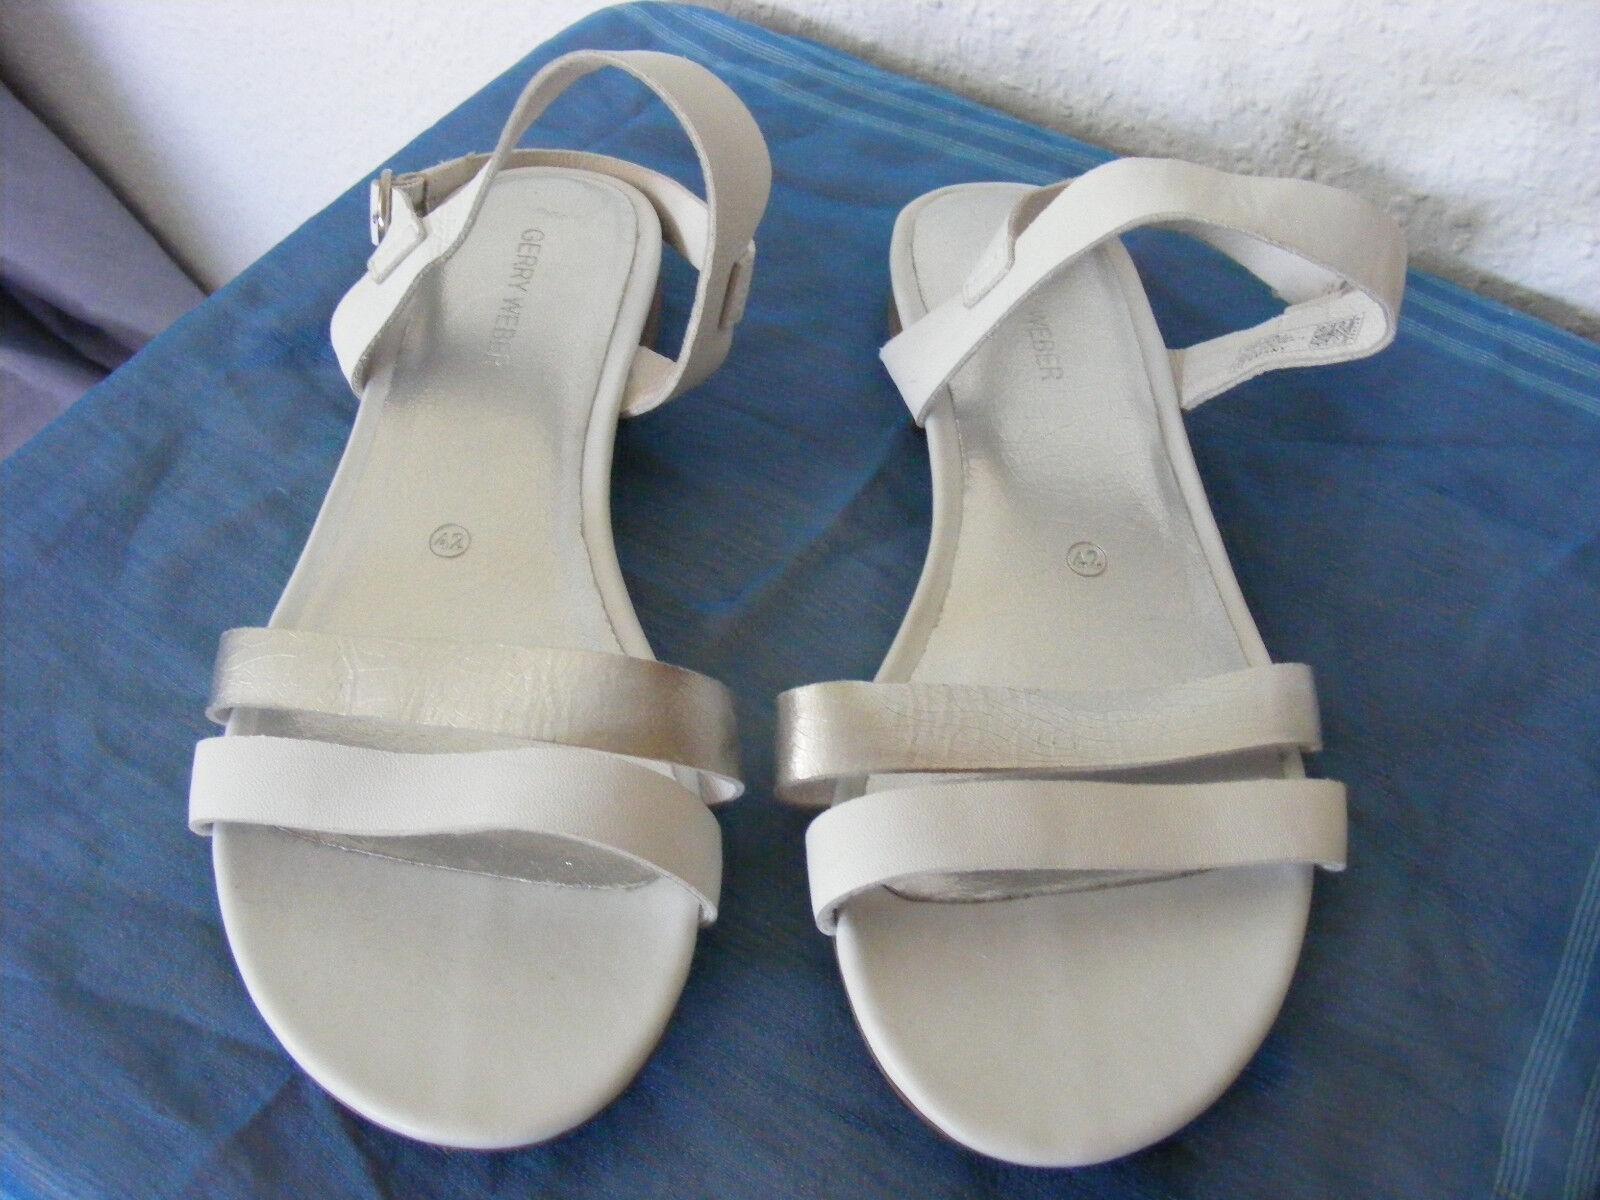 NEU Gr. 42 weiße weiß Sandalen GERRY WEBER NEU weiß weiße modern klassisch bequem flach 534a59